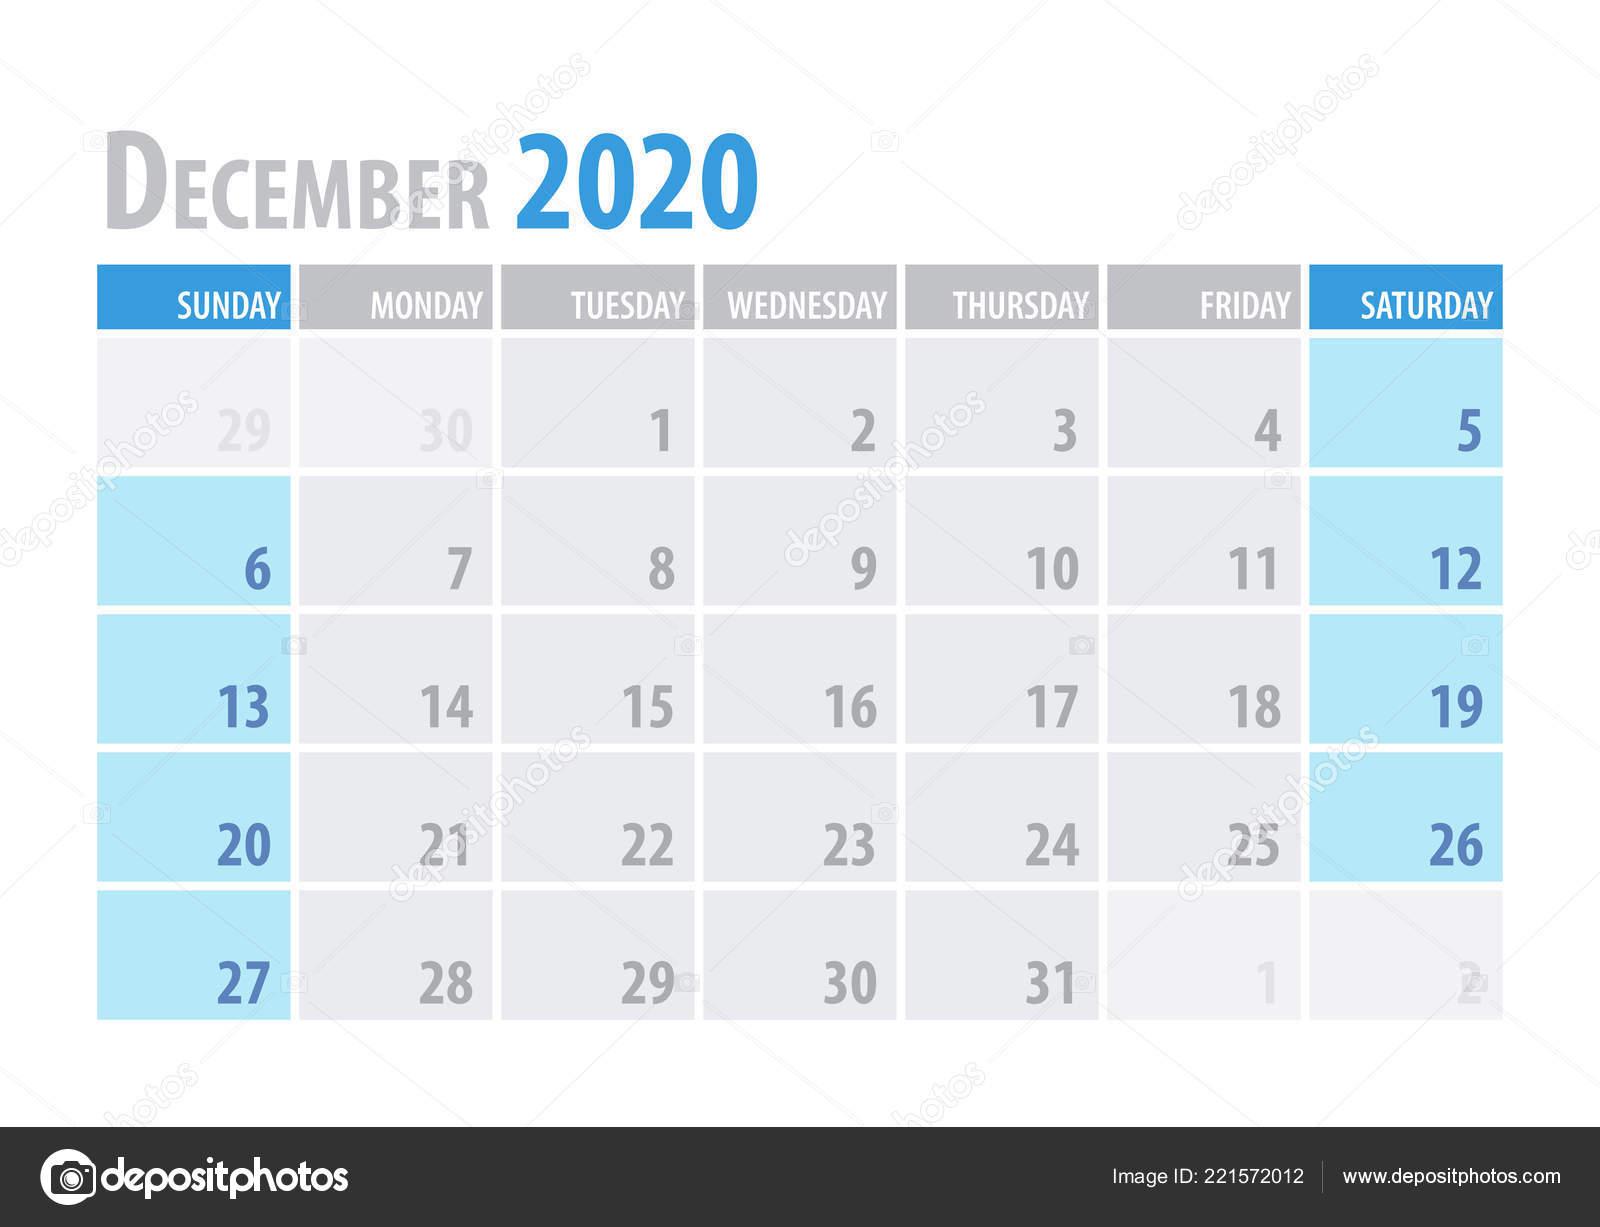 December Calendar 2020.December Calendar Planner 2020 In Clean Minimal Table Simple Style